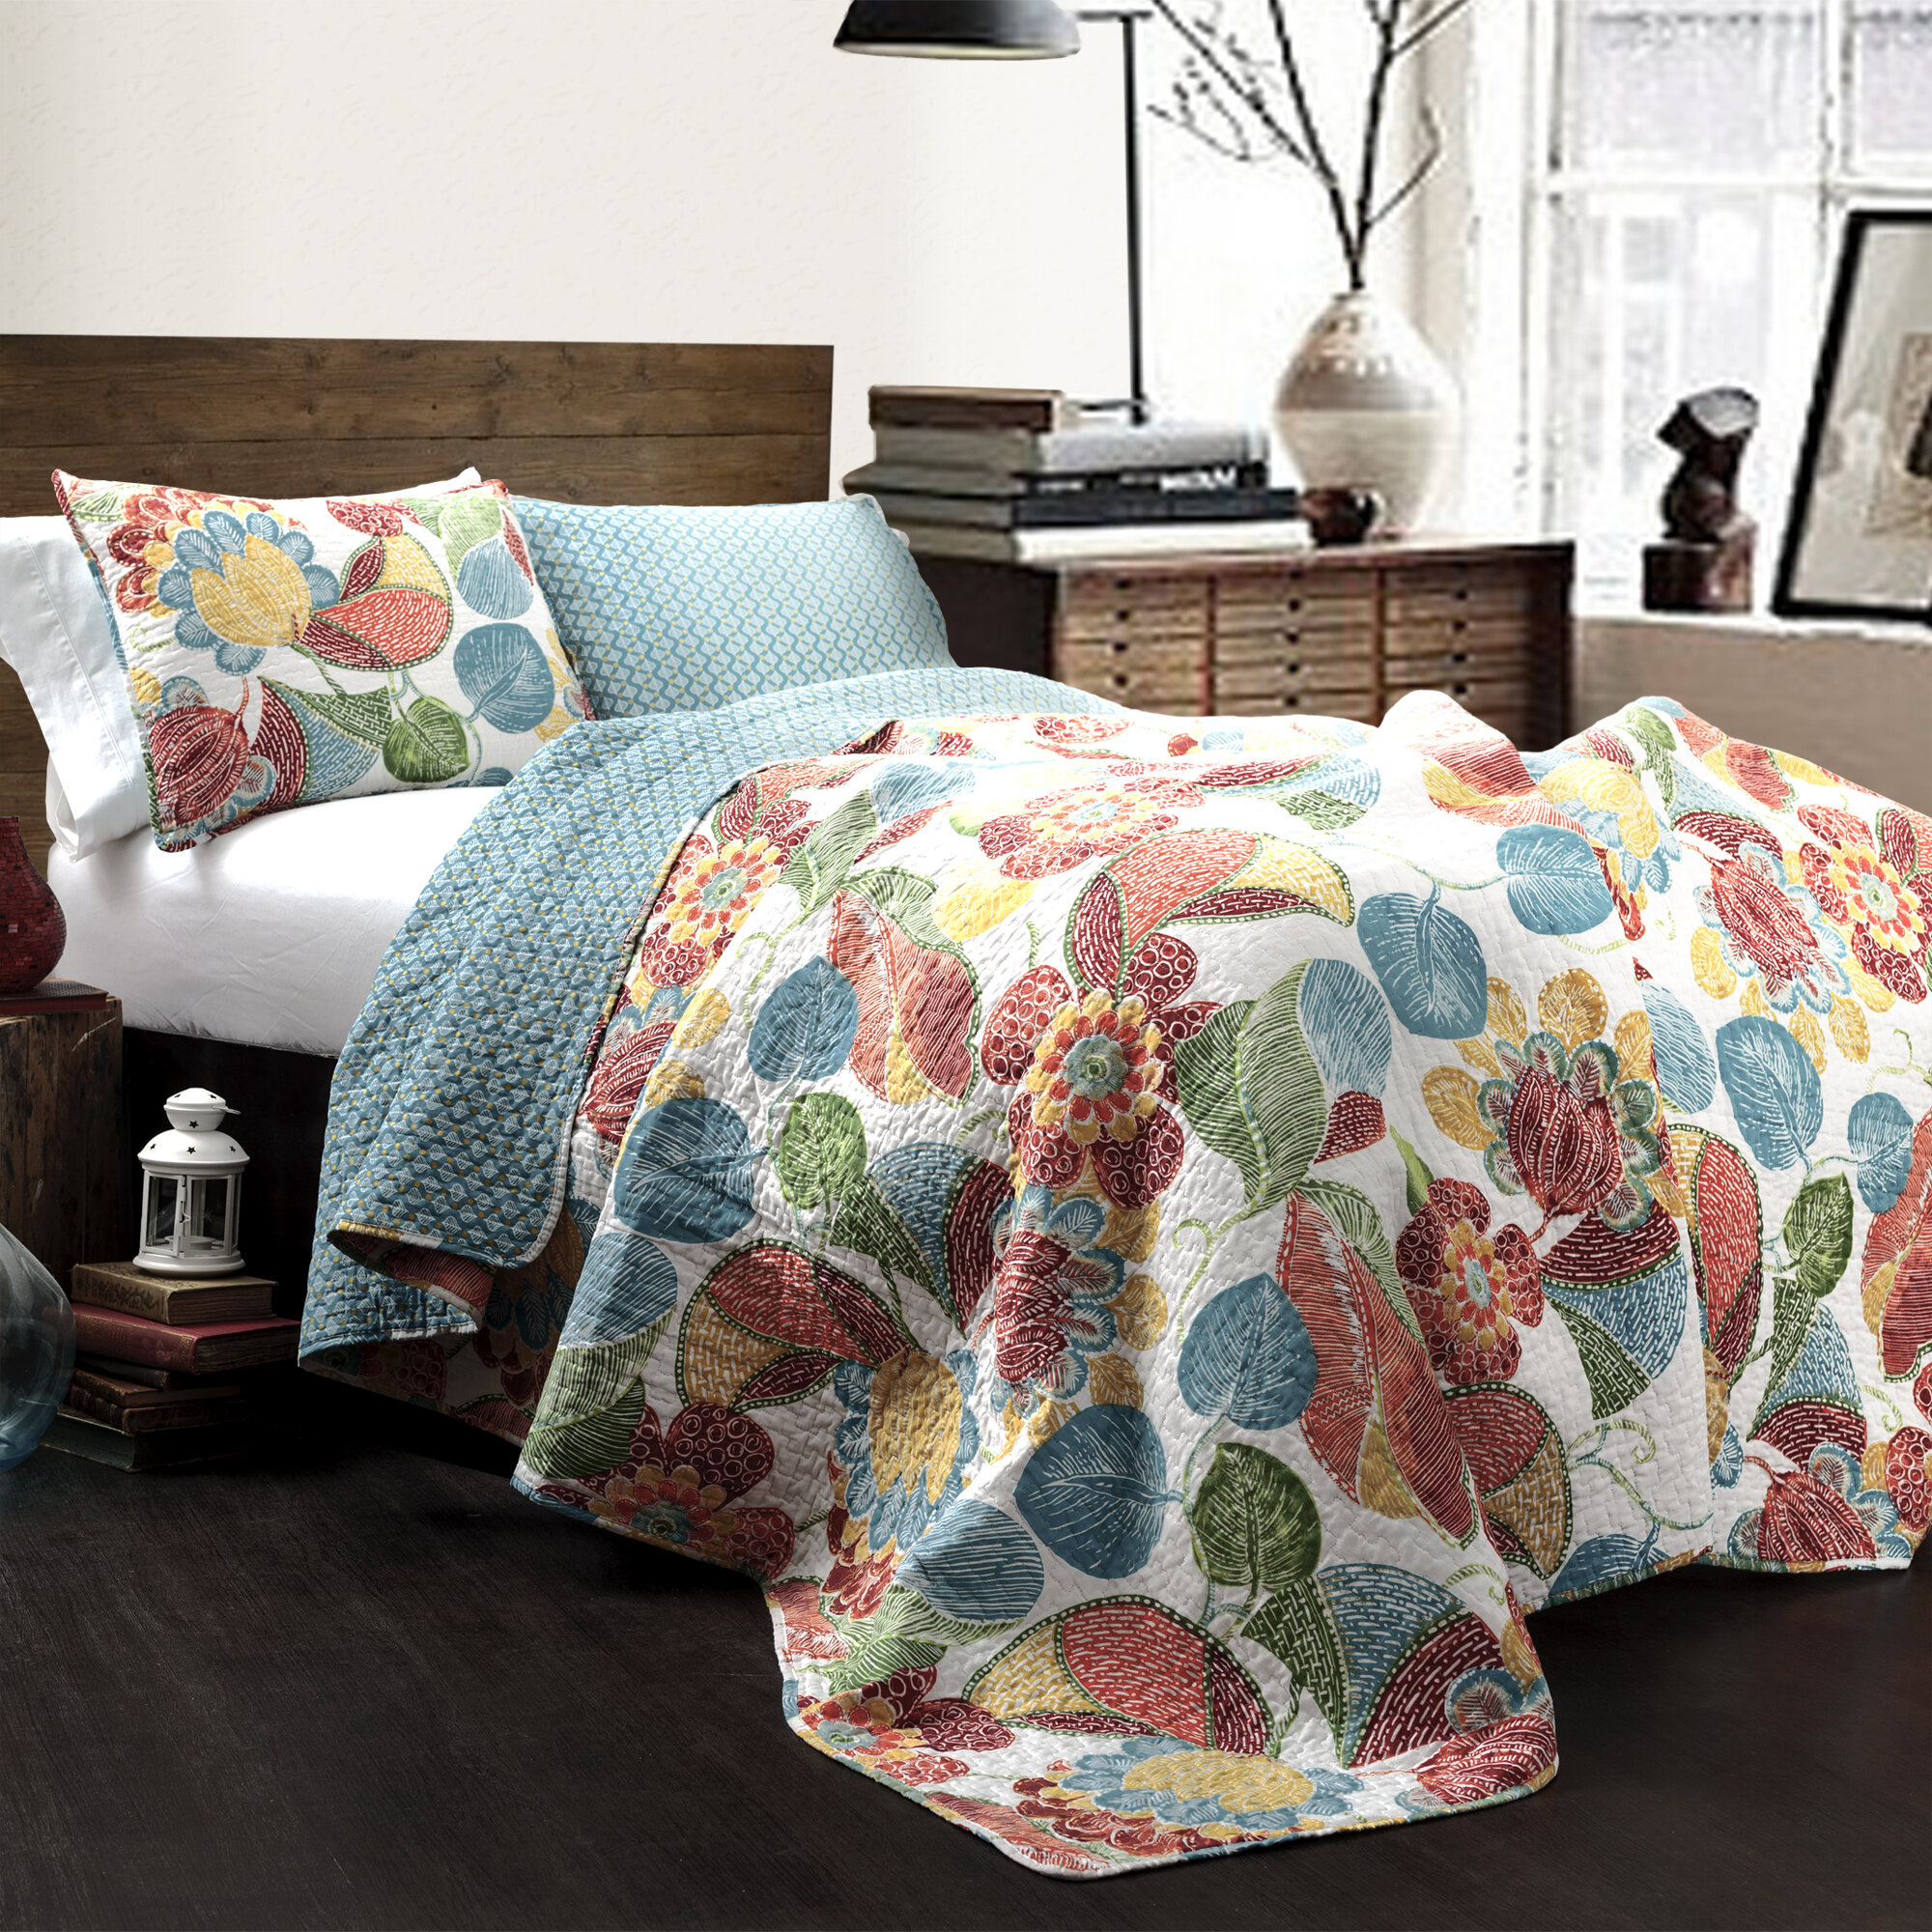 100 Cotton Quilts Coverlets Sets You Ll Love Wayfair